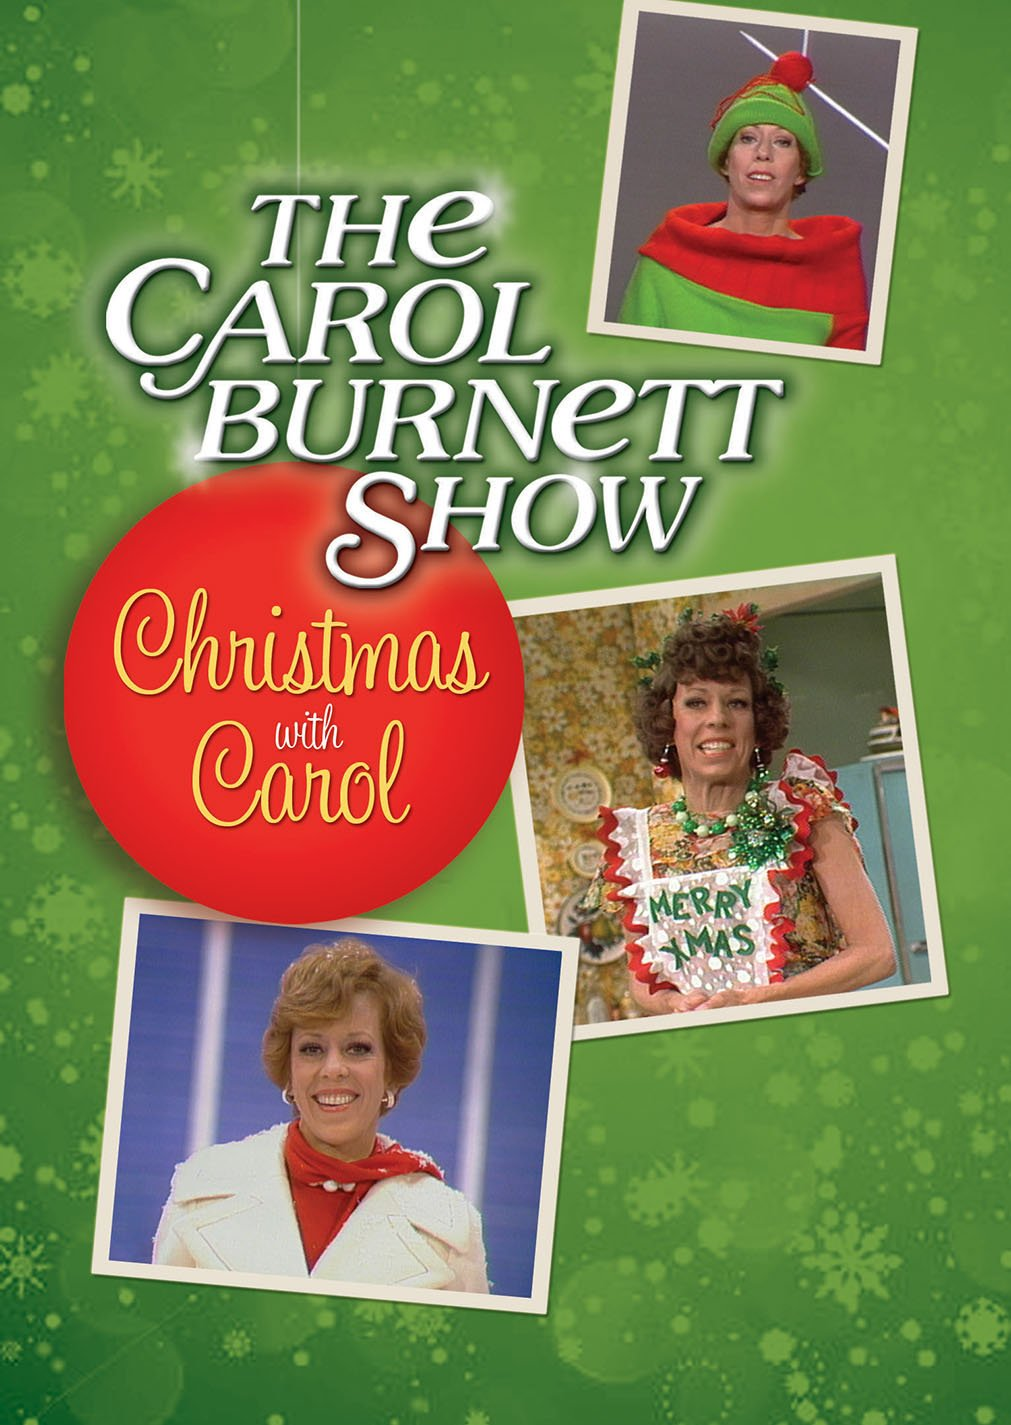 Amazon.com: The Carol Burnett Show: Christmas with Carol: Carol ...